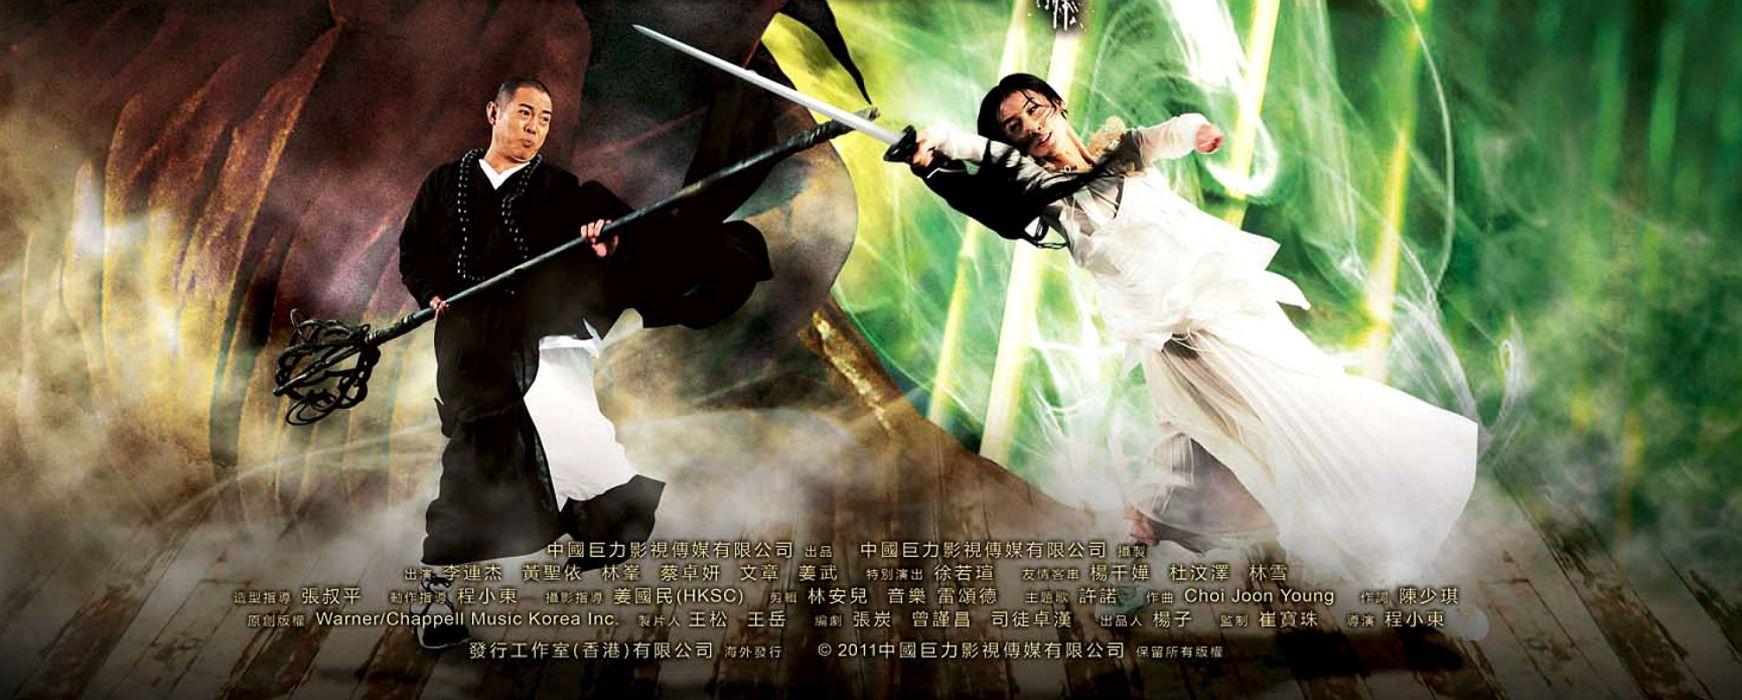 Sorcerer-and-the-White-Snake action fantasy martial sorcerer white snake (31) wallpaper